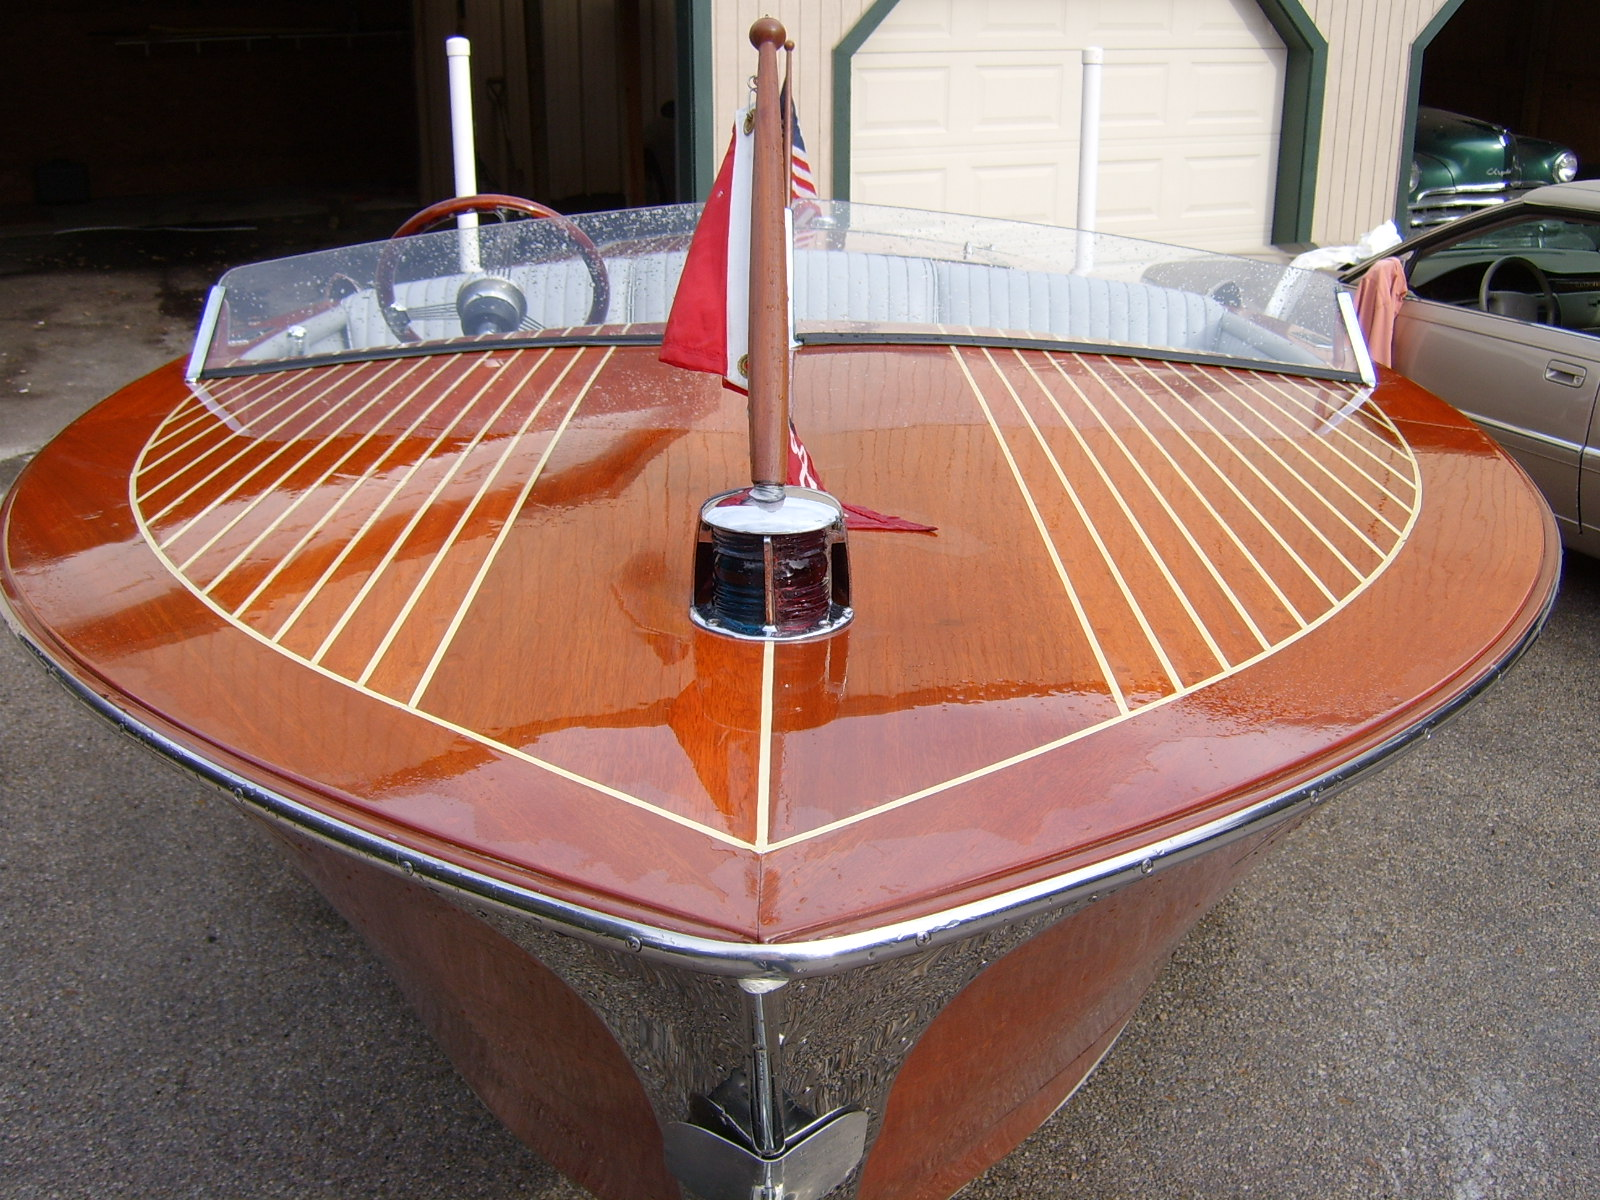 1960 chris craft cavalier sportsman 23html in nowywyvebolgithubcom source code